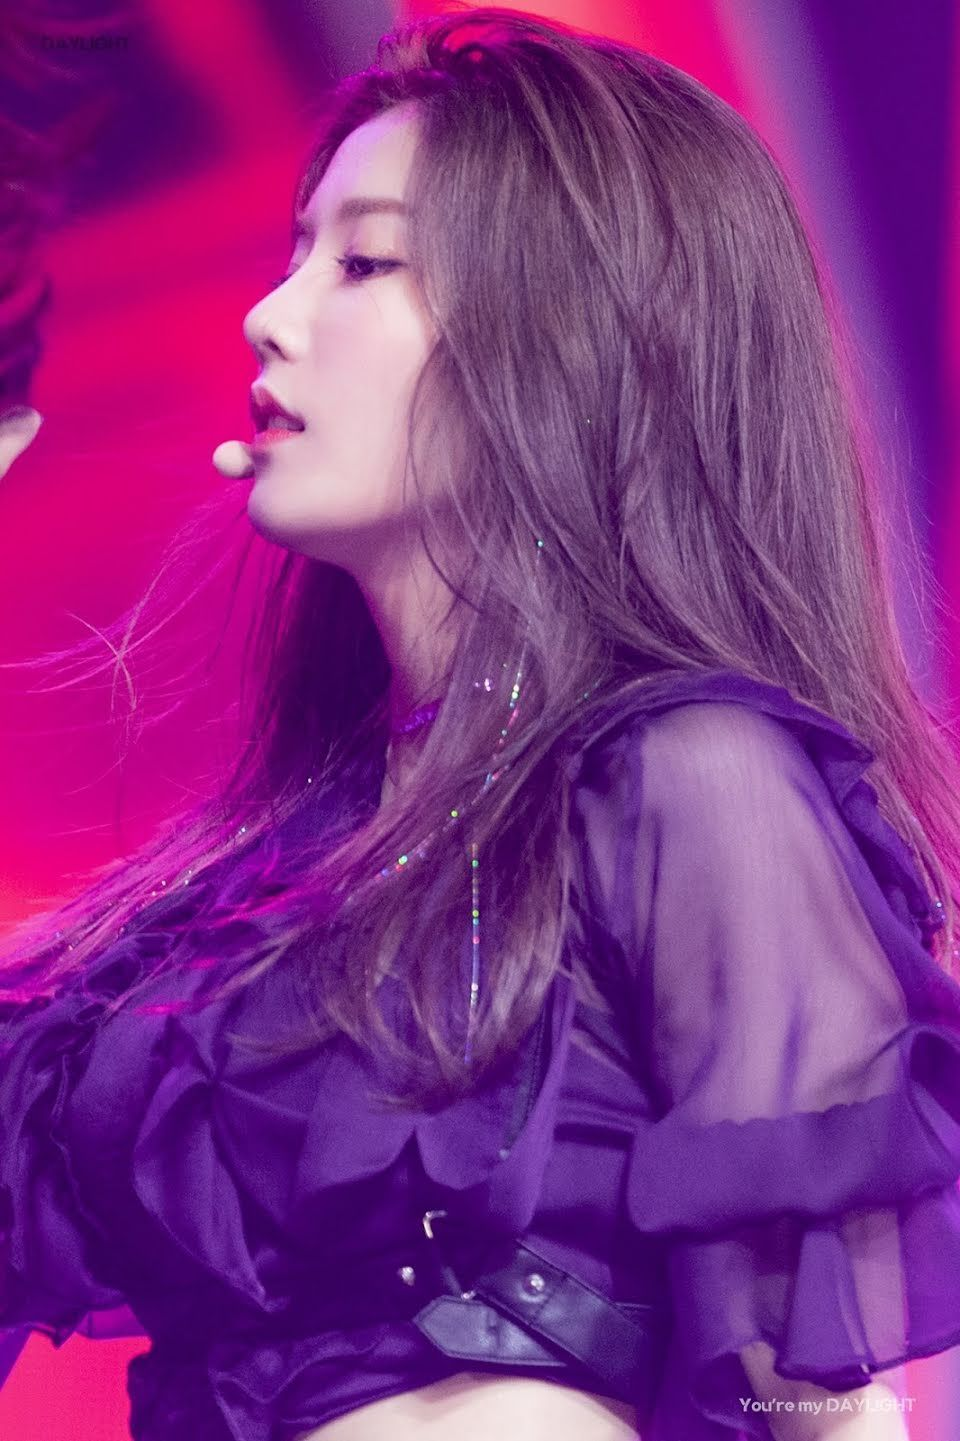 Izoneeunbi2 Kpop Girls Kpop Hair Beauty Girl